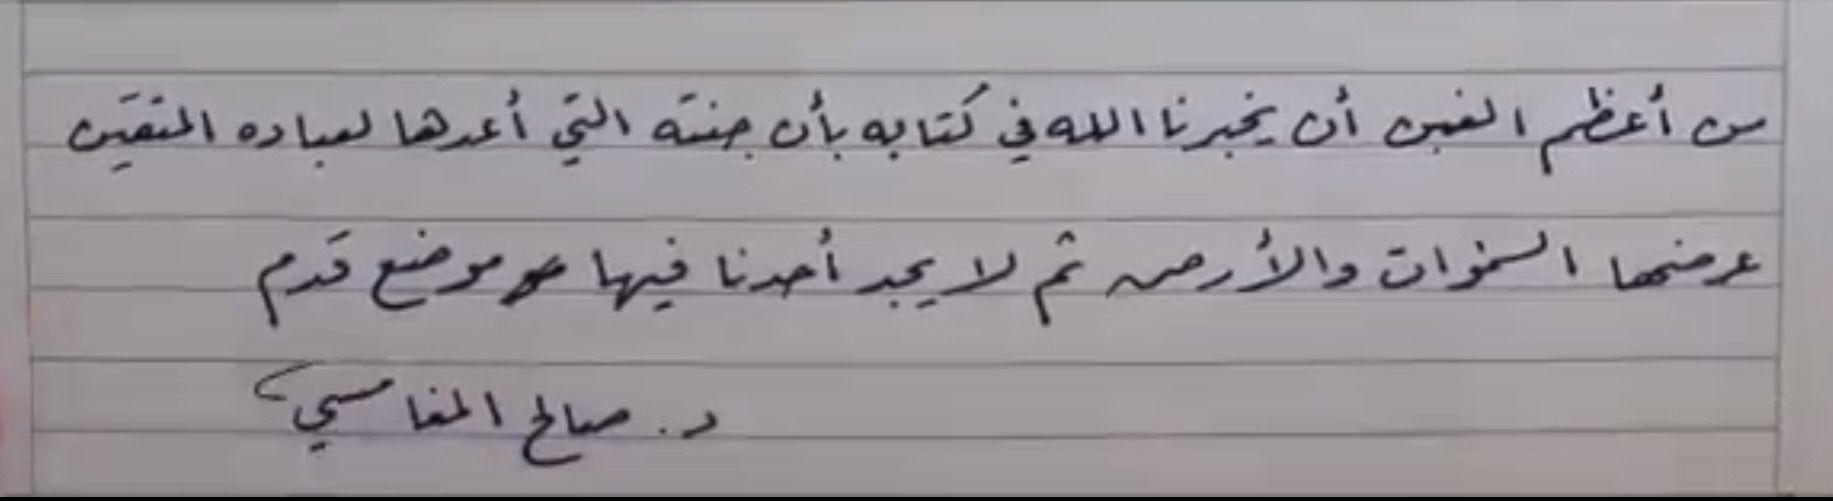 Pin By سوف الجين On تعلم خط الرقعة بالقلم العادي Math Calligraphy Arabic Calligraphy